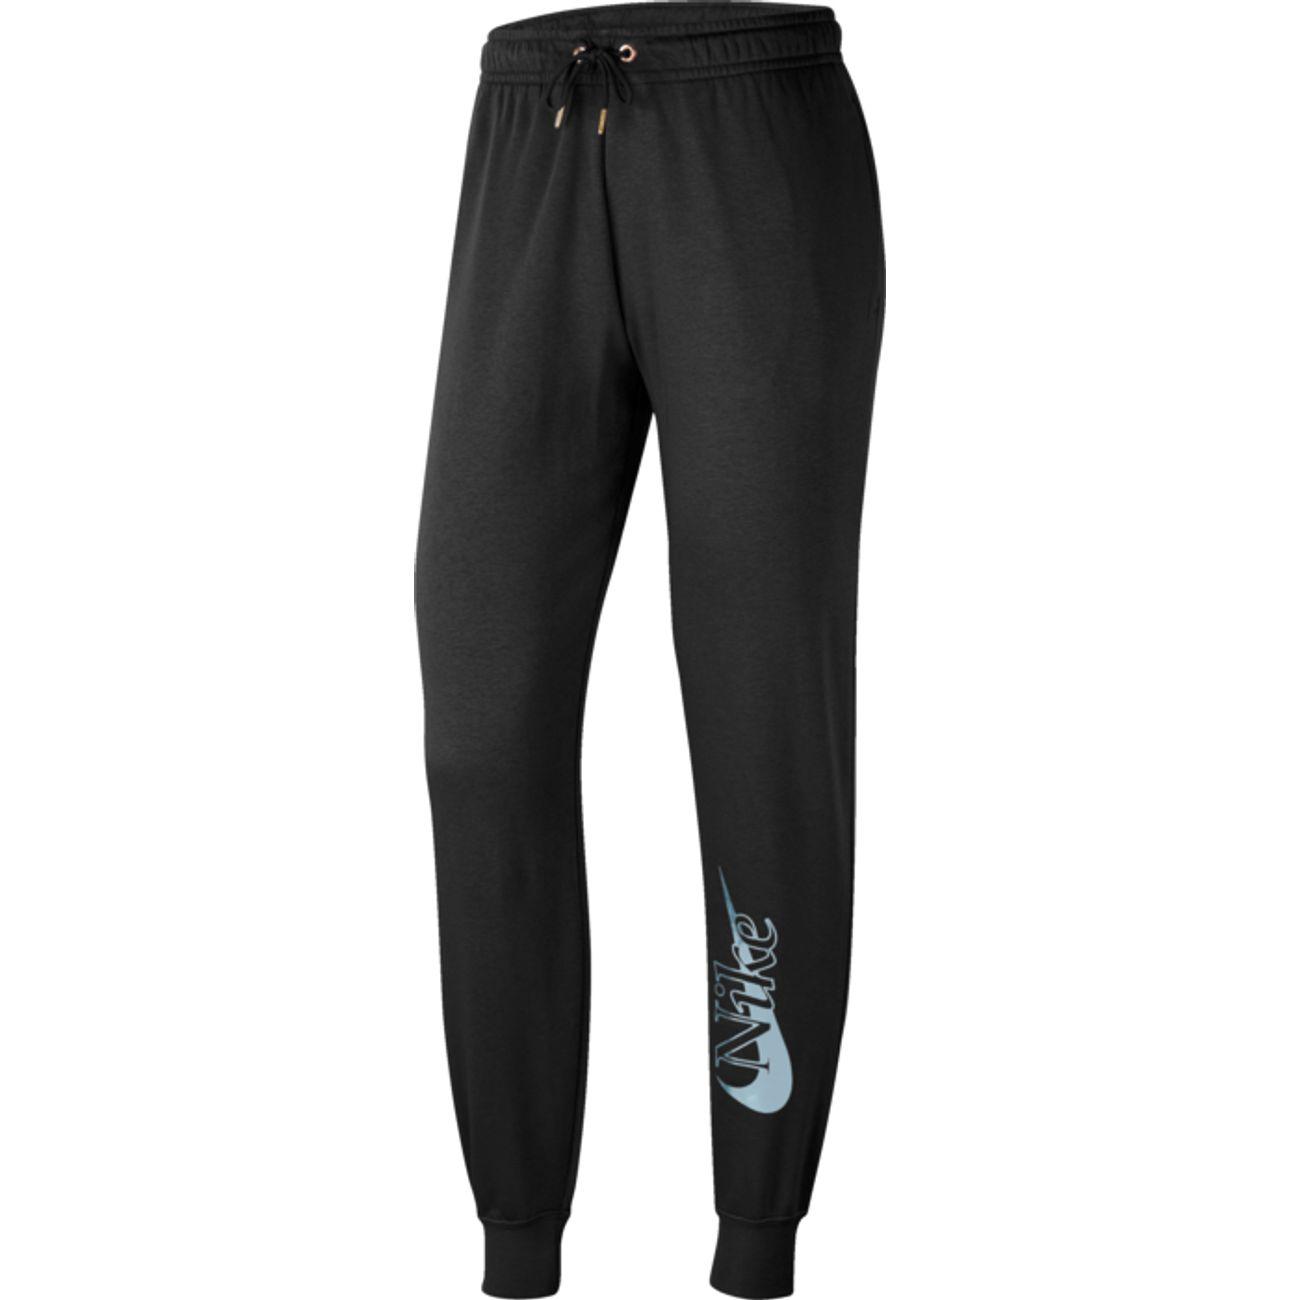 PANTALON Multisport femme NIKE Nike Sportswear Icon Clash